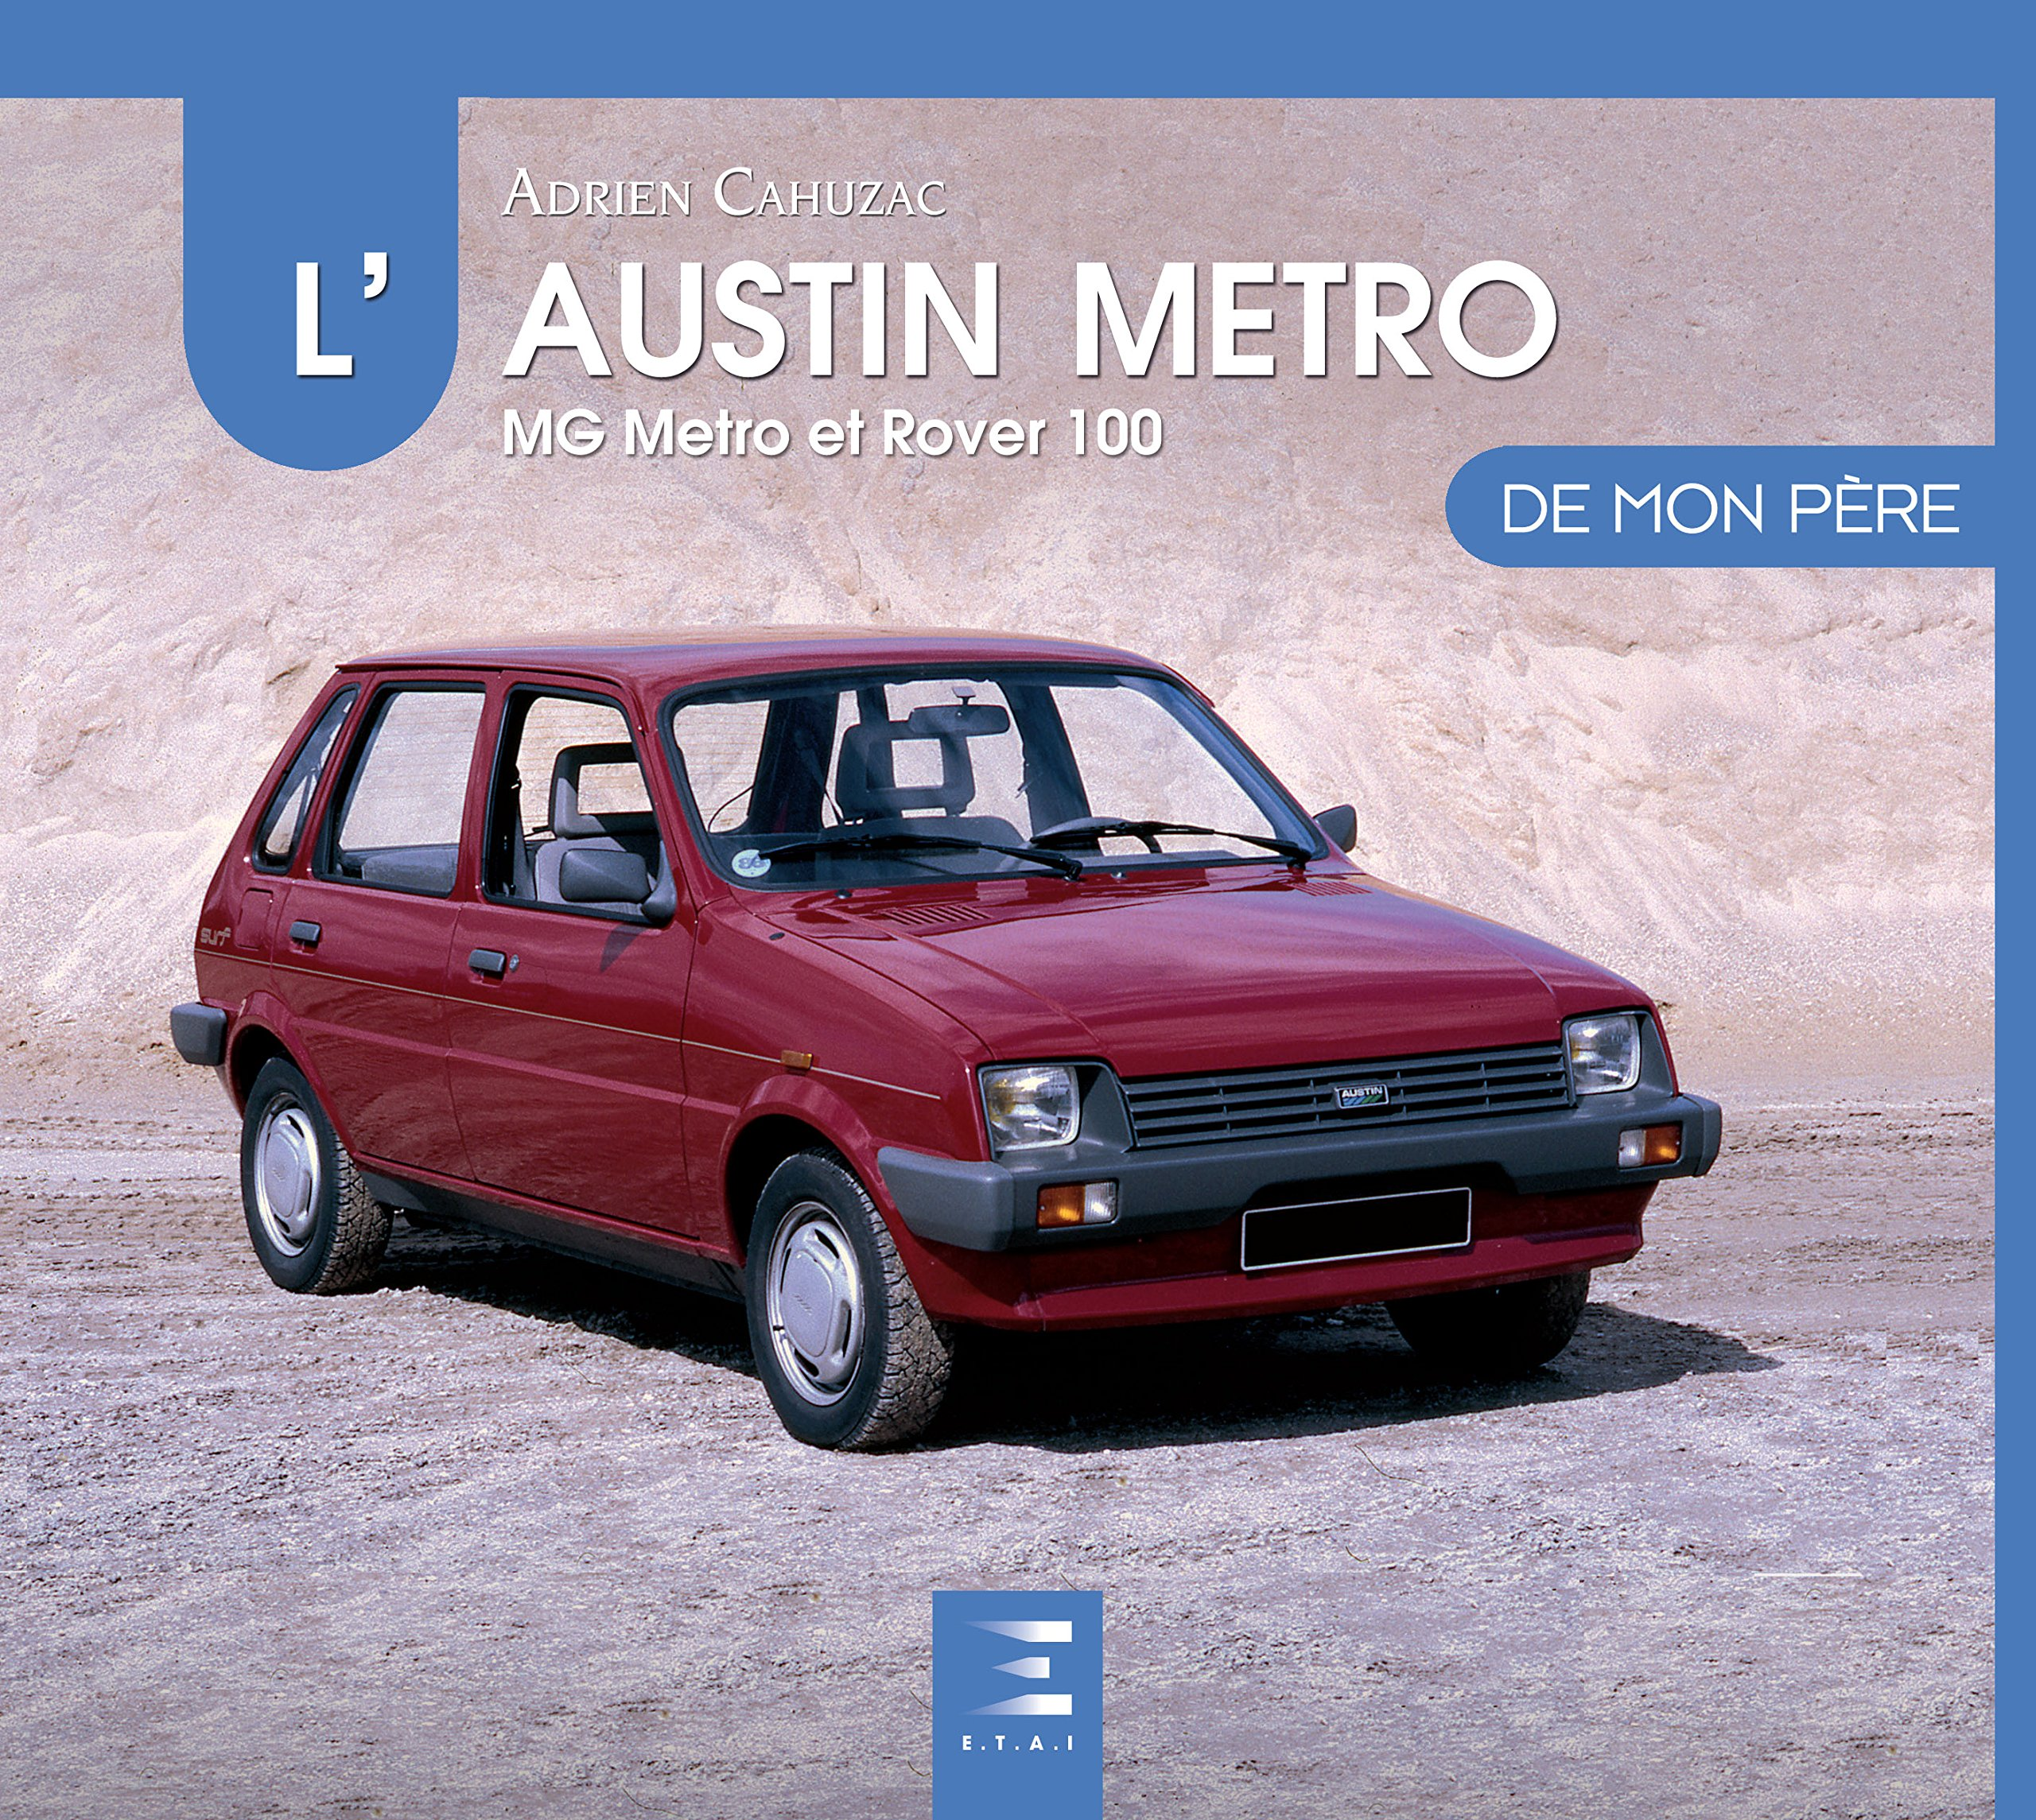 LAustin Metro de mon père : MG Metro et Rover 100: Amazon.es: Adrien Cahuzac: Libros en idiomas extranjeros